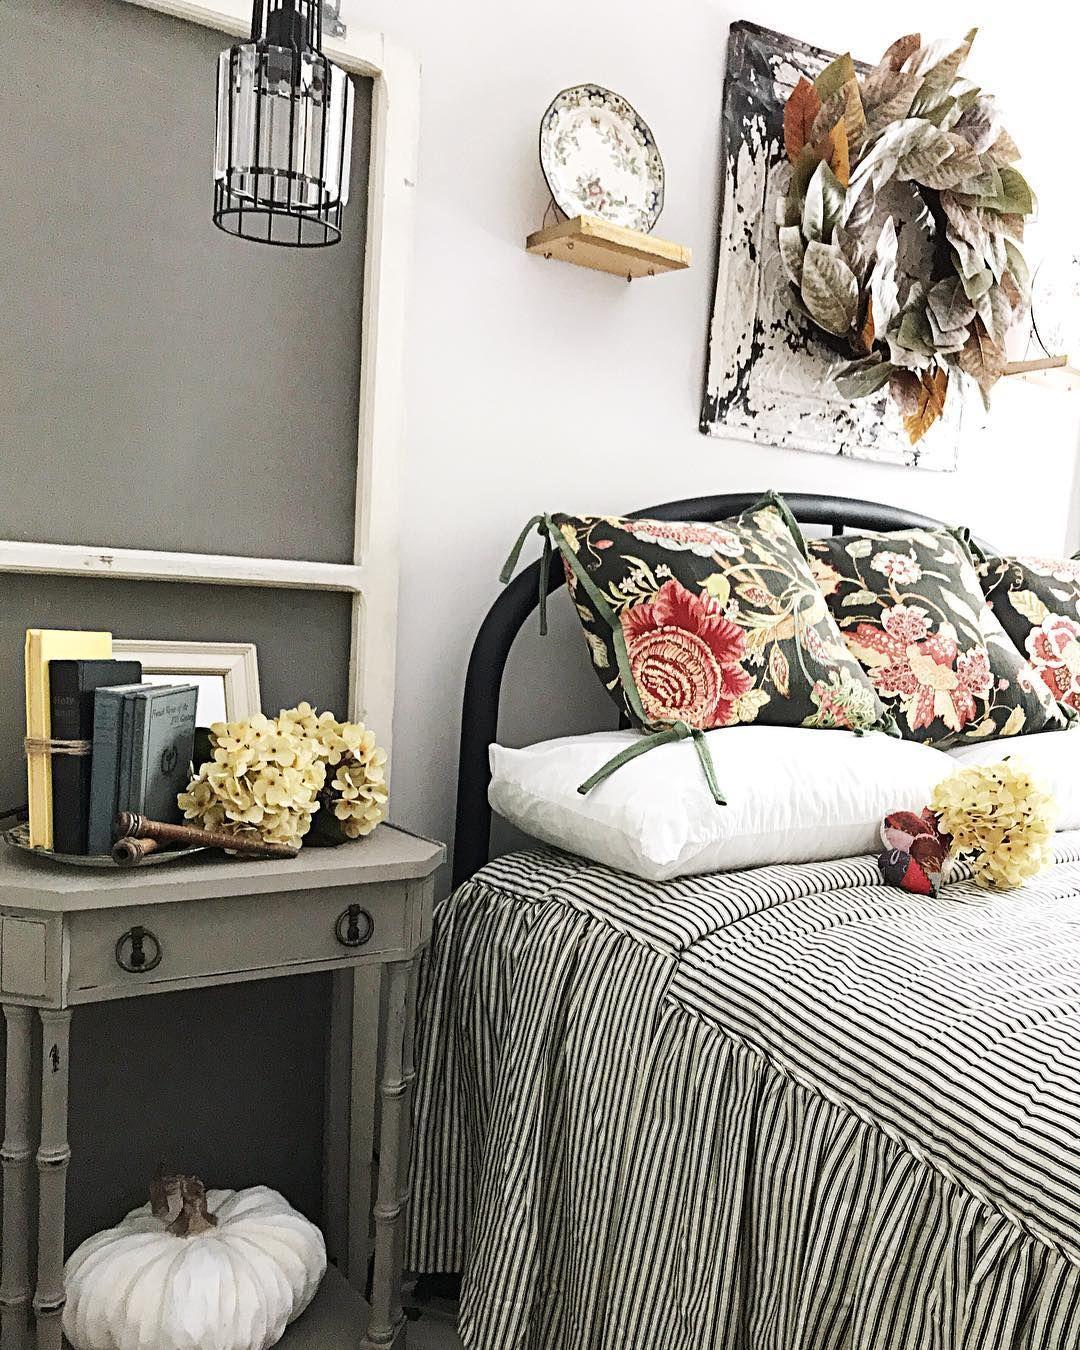 Bed head against window  pin by wilma feitel on  bedrooms in   pinterest  bedroom